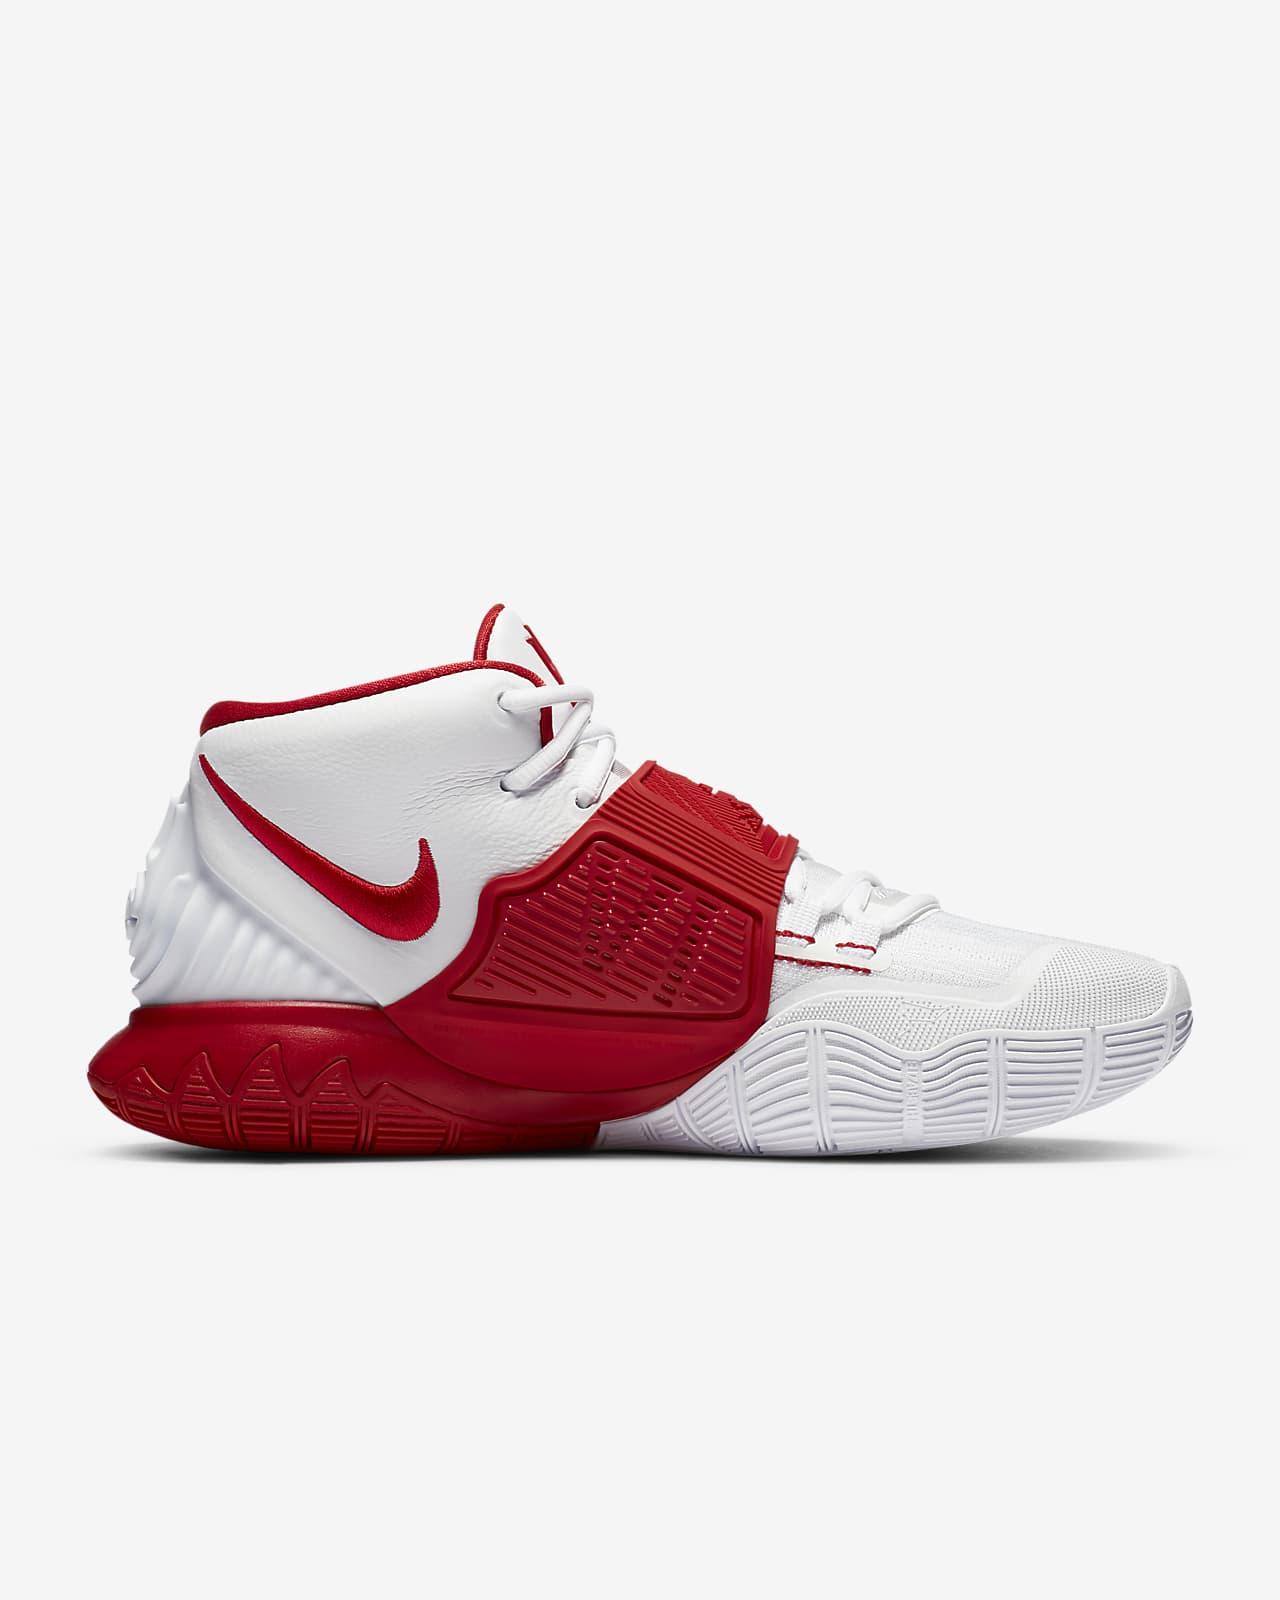 Kyrie 6 (Team) EP Basketball Shoe. Nike SG